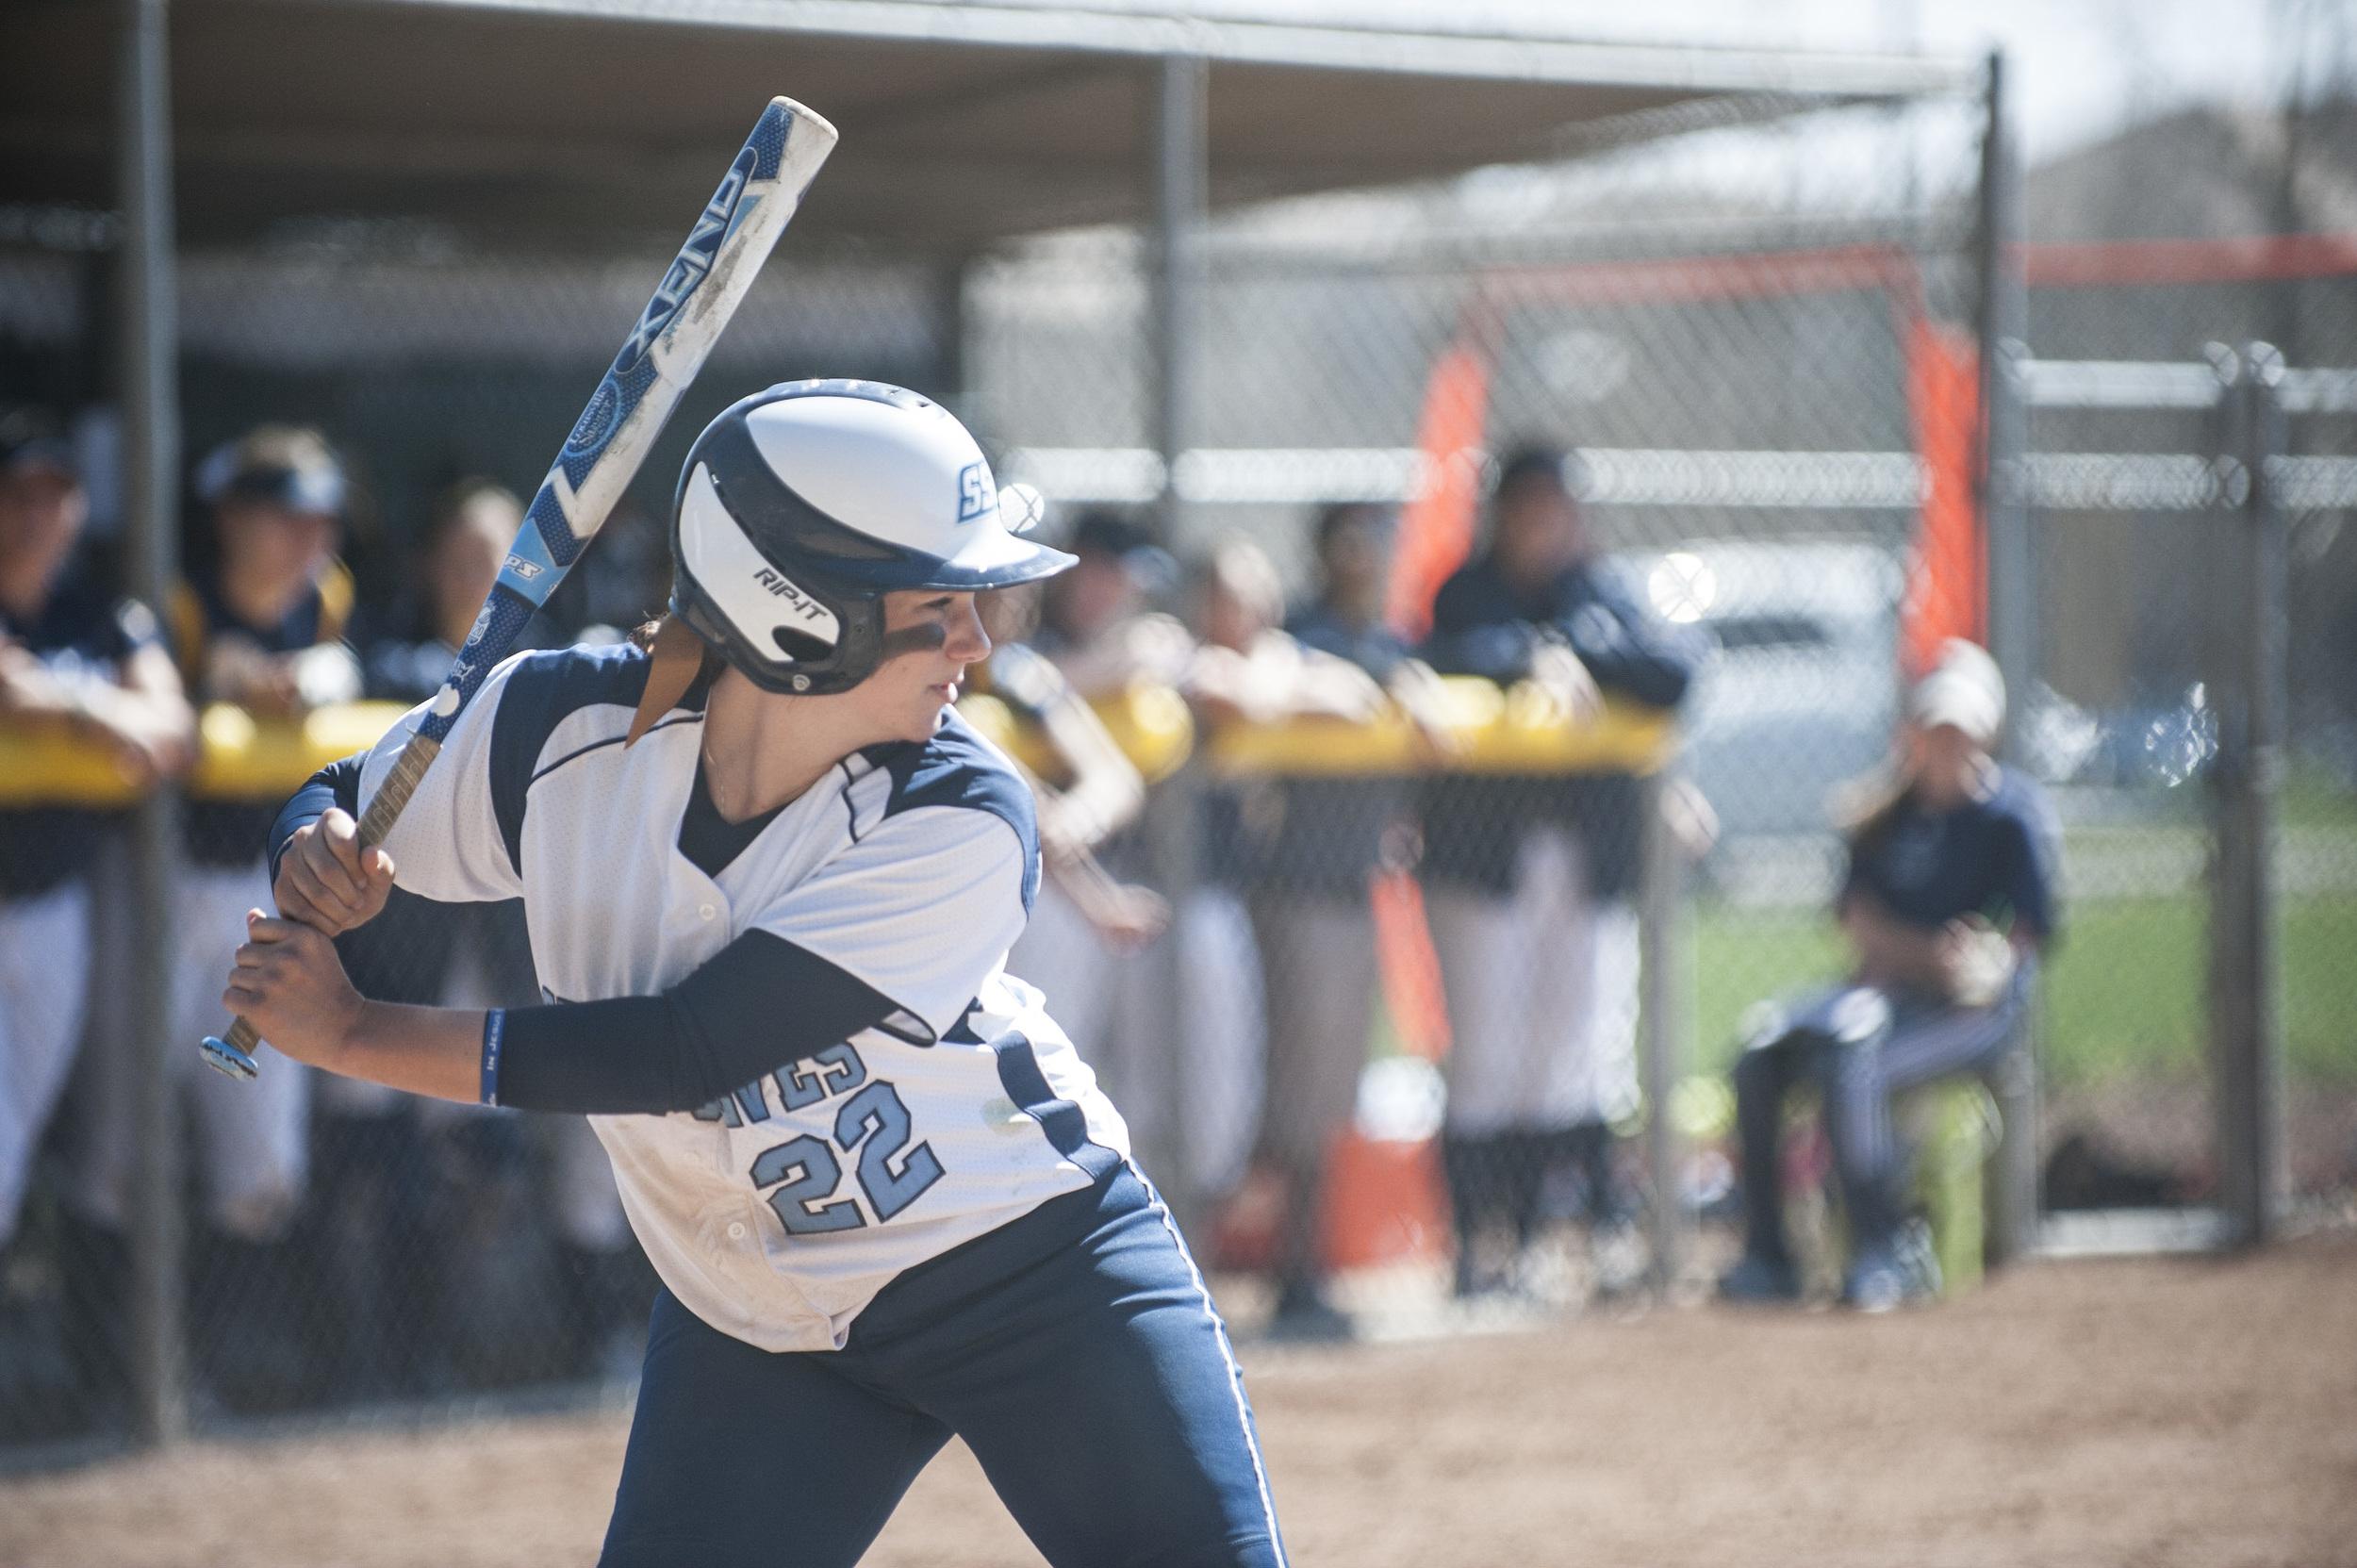 SSU softball player up to bat